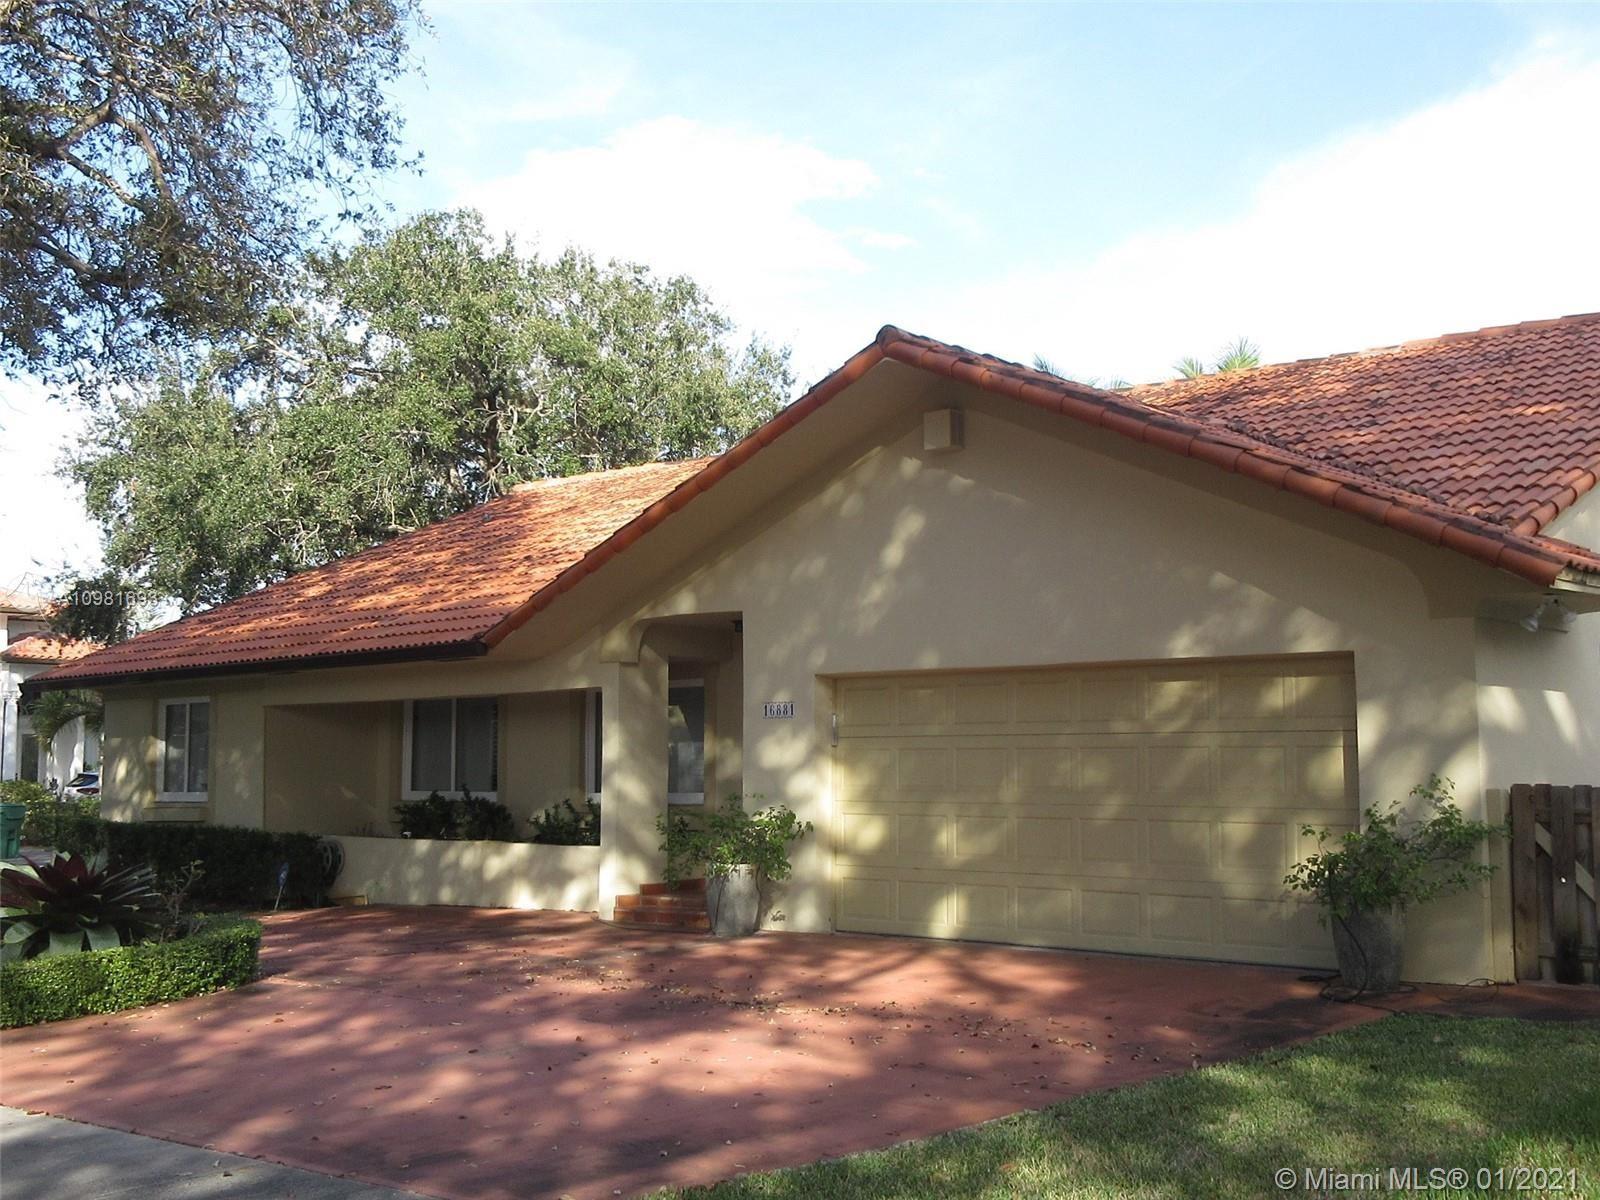 16881 NW 78th Pl, Miami Lakes, FL 33016 - #: A10981693